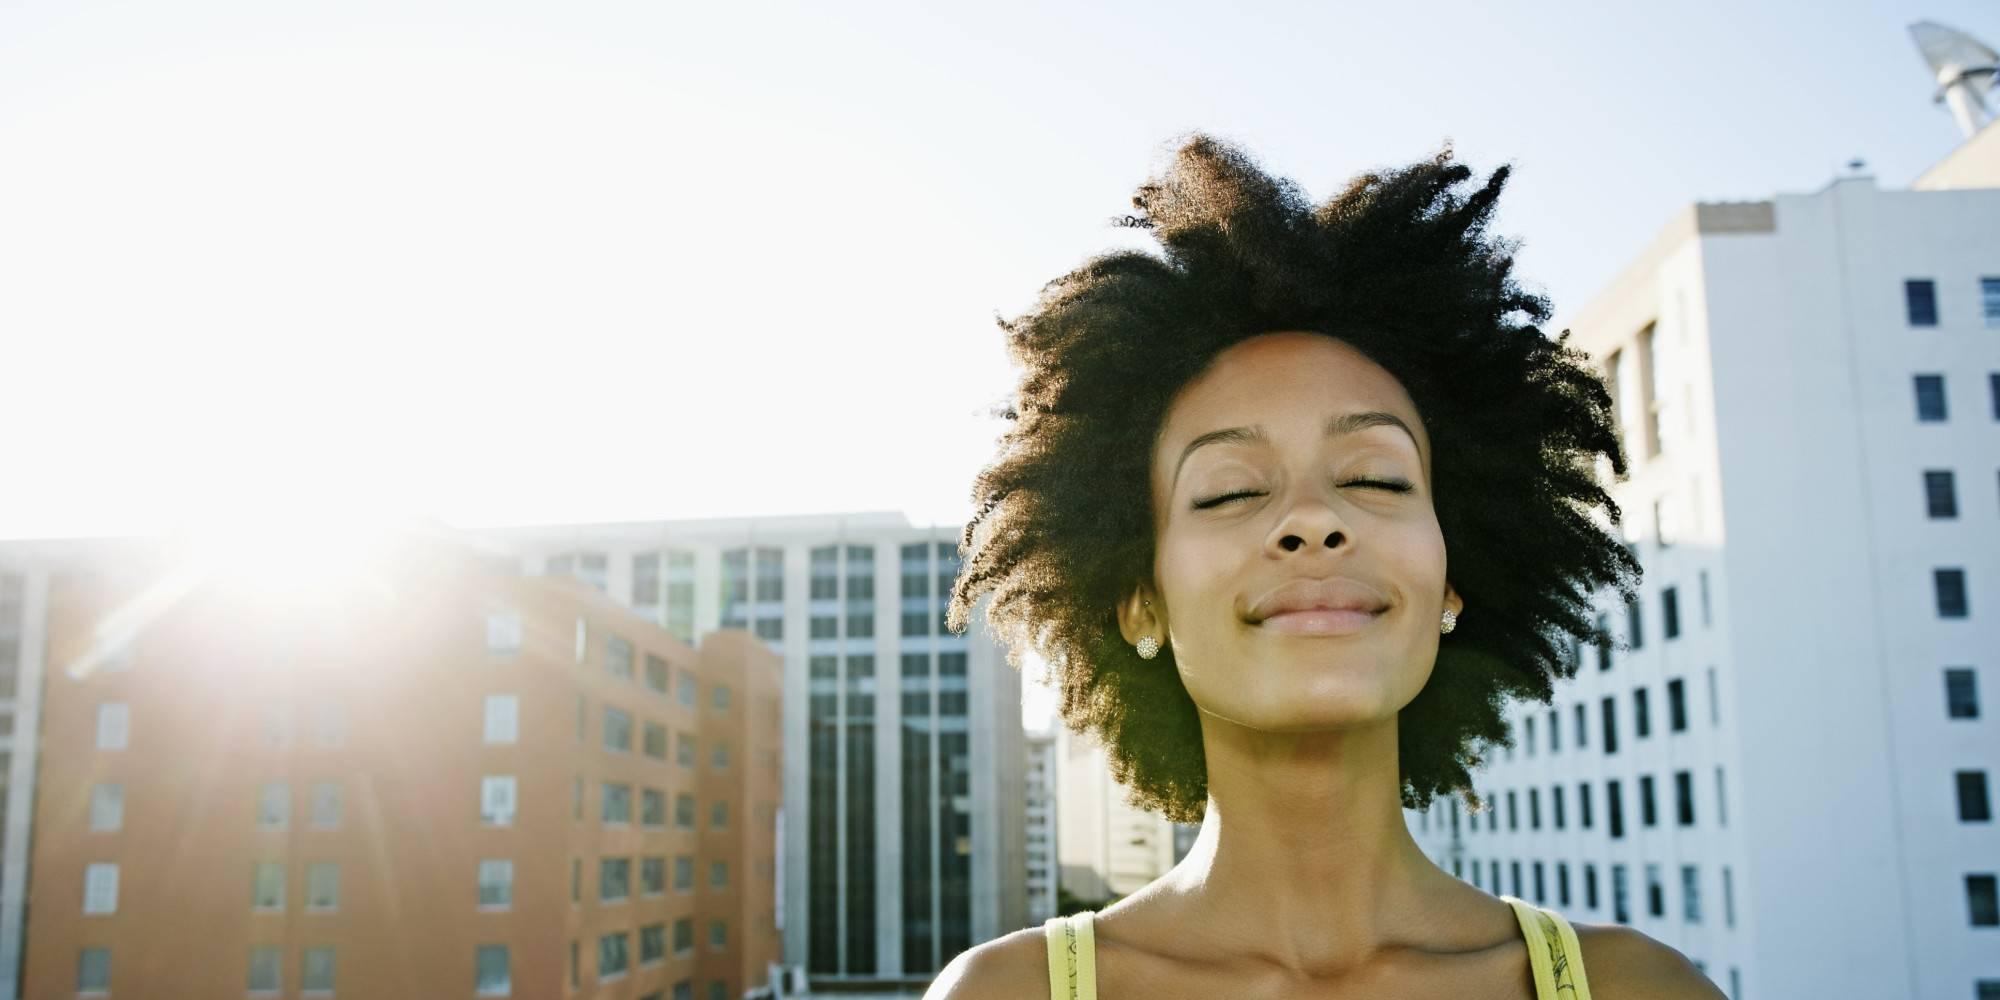 http://www.ebony.com/wellness-empowerment/mental-sanity-preservation#axzz4MhmCUti6